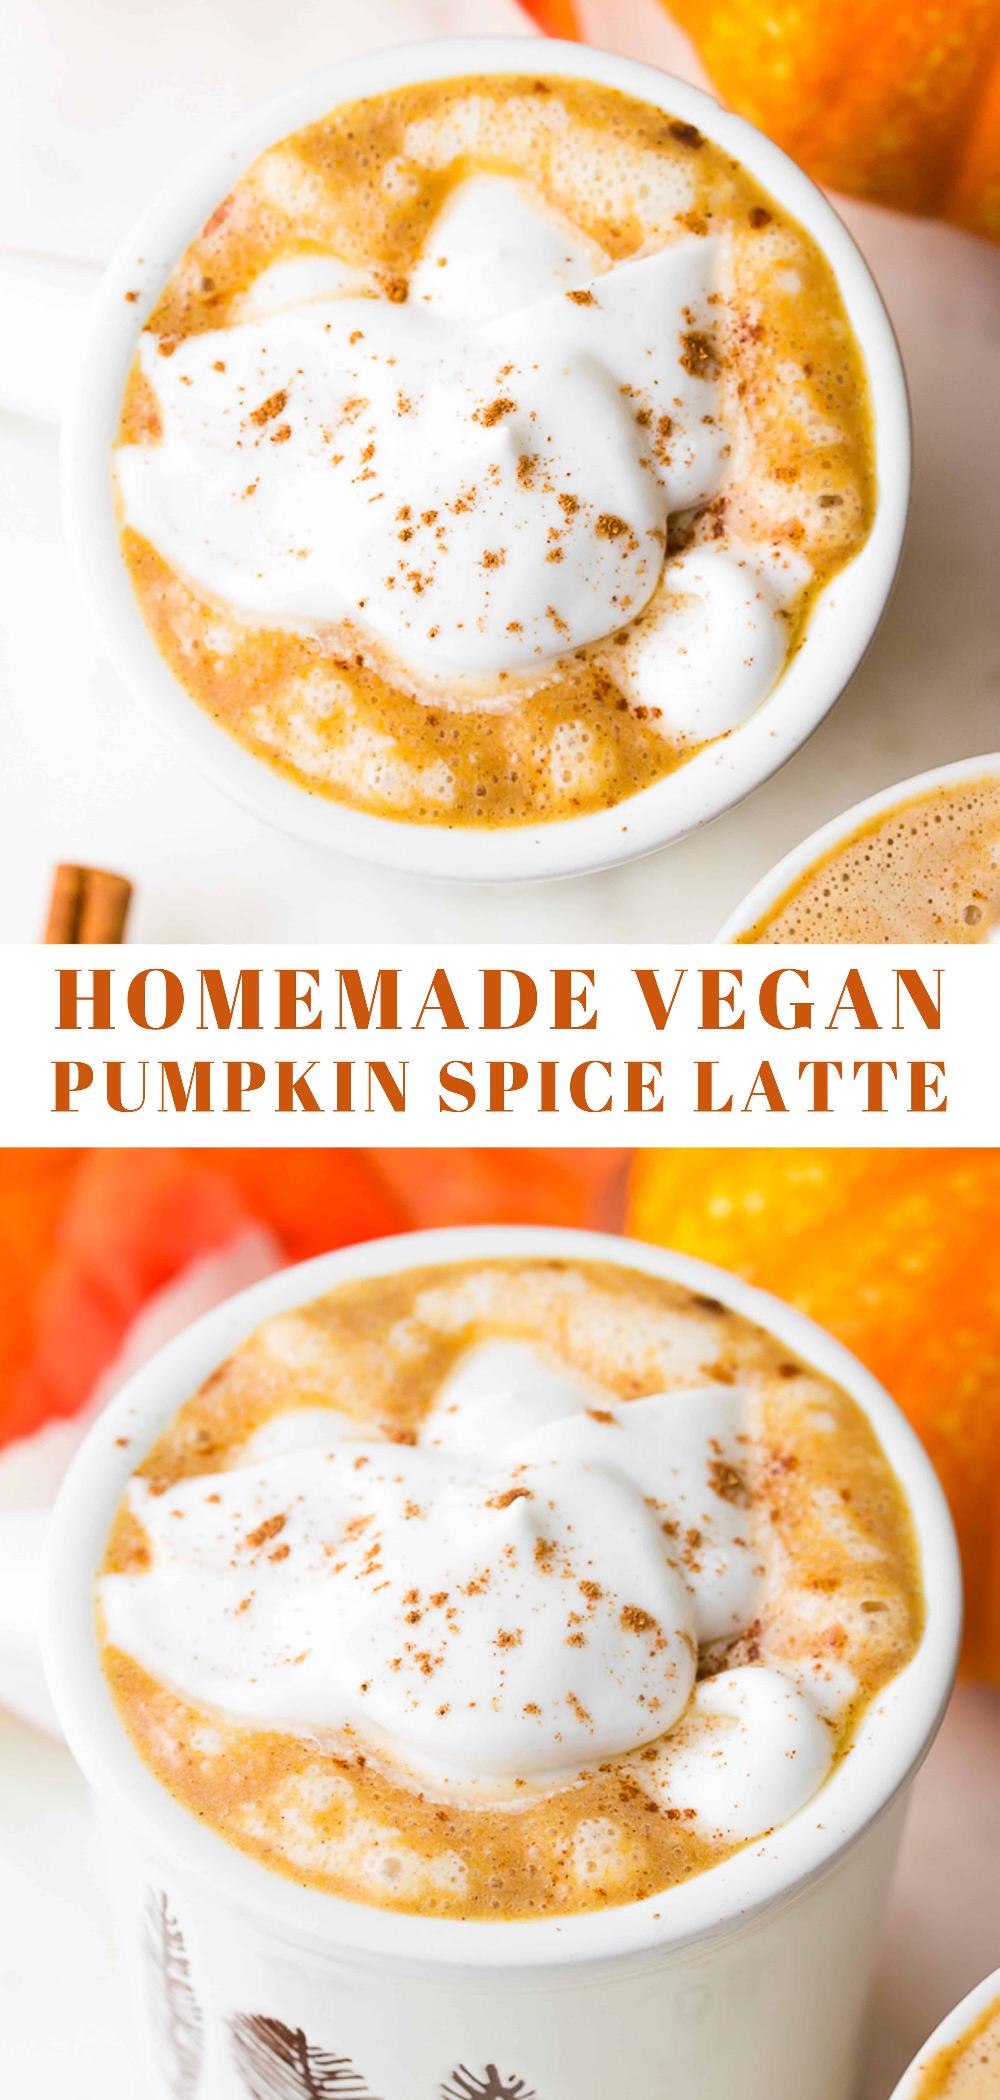 Starbucks Copycat Vegan Pumpkin Spice Latte Easy Recipe Vegan Plantbased Dairyfree In 2020 Vegan Pumpkin Spice Latte Vegan Pumpkin Spice Vegan Drinks